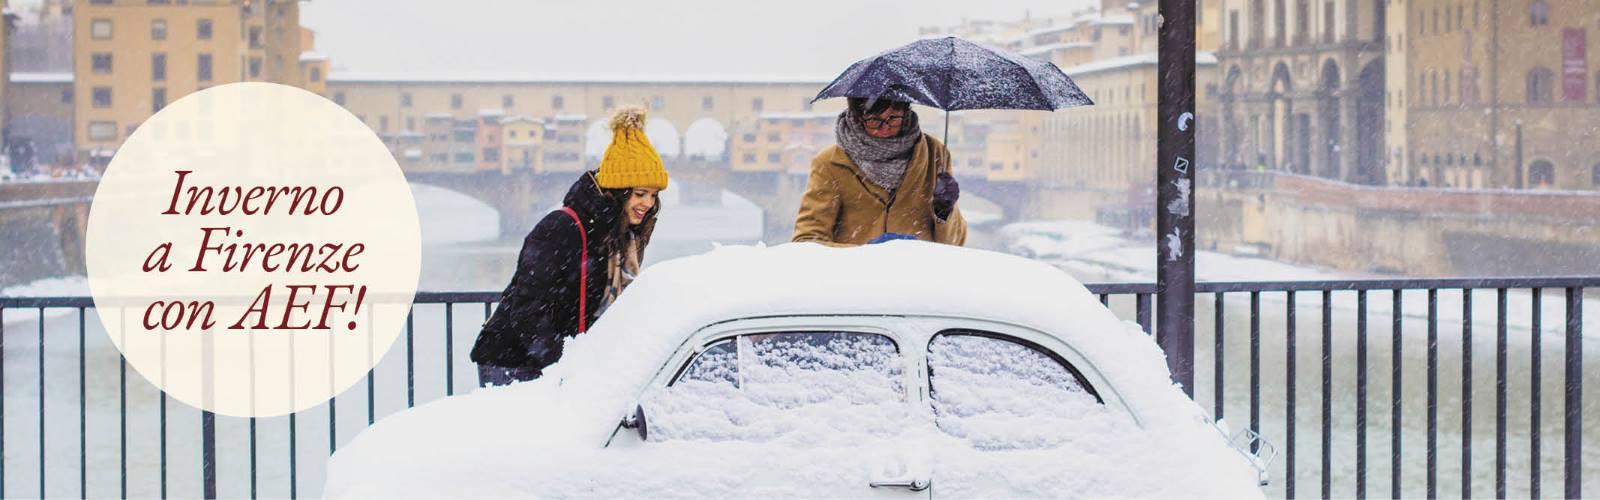 inverno-it